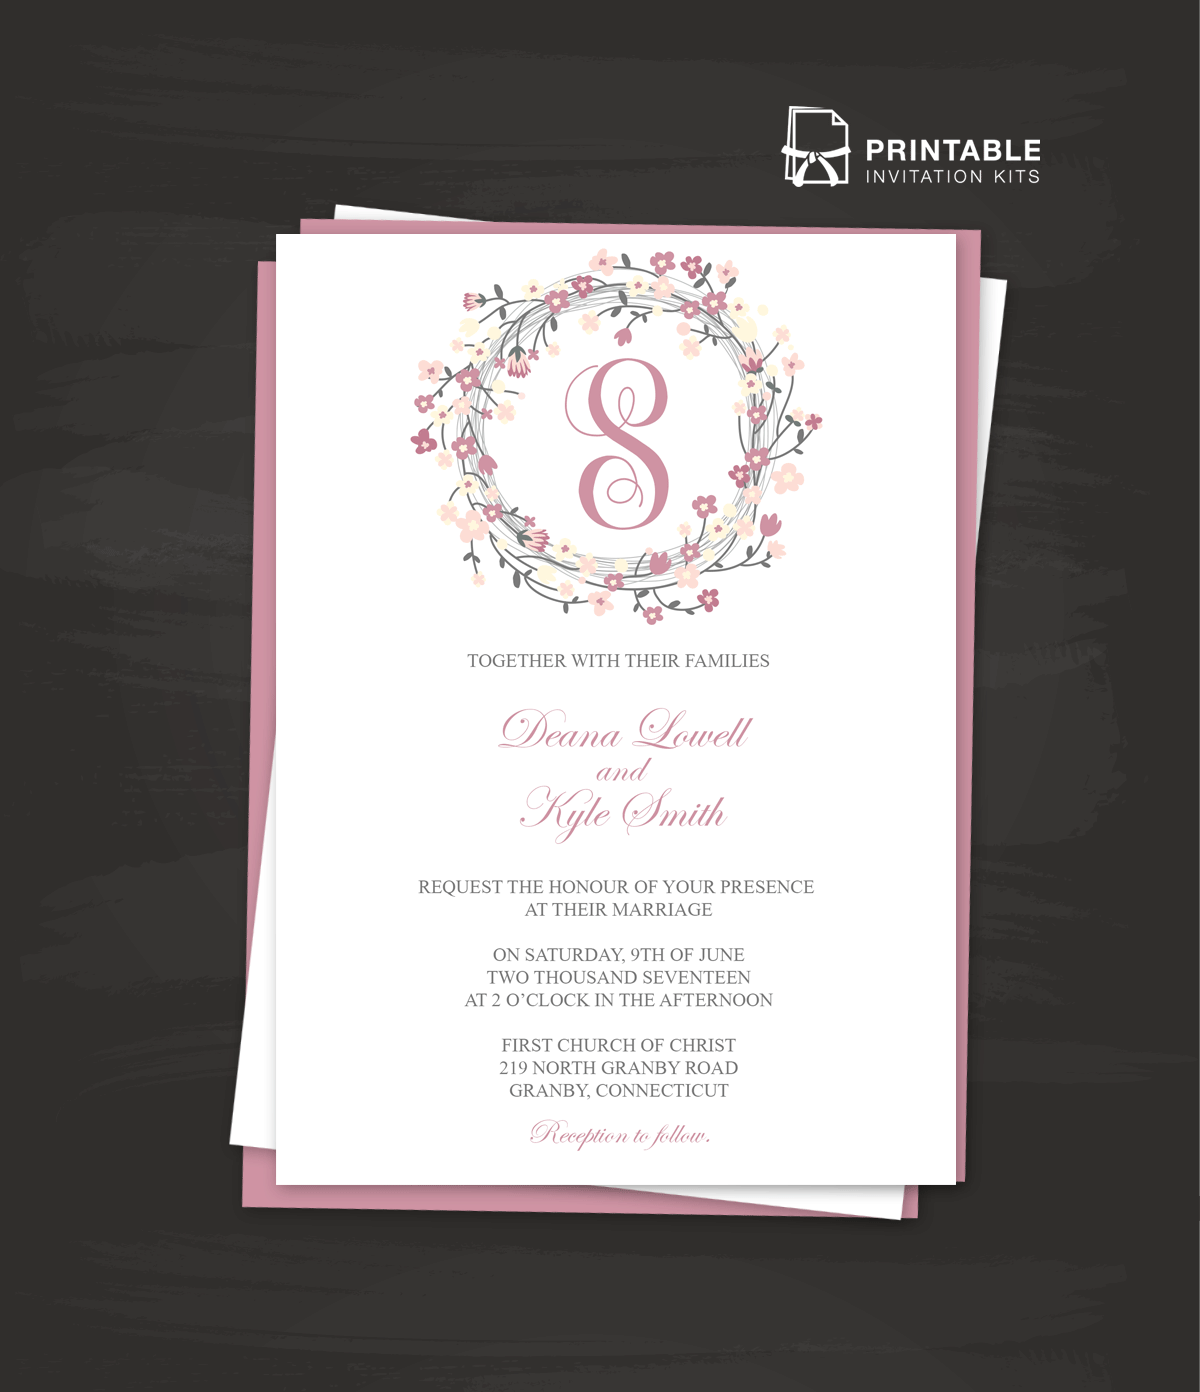 Floral Wreath Logo Invitation Template ← Wedding Invitation Templates – Printable Invitation Kits